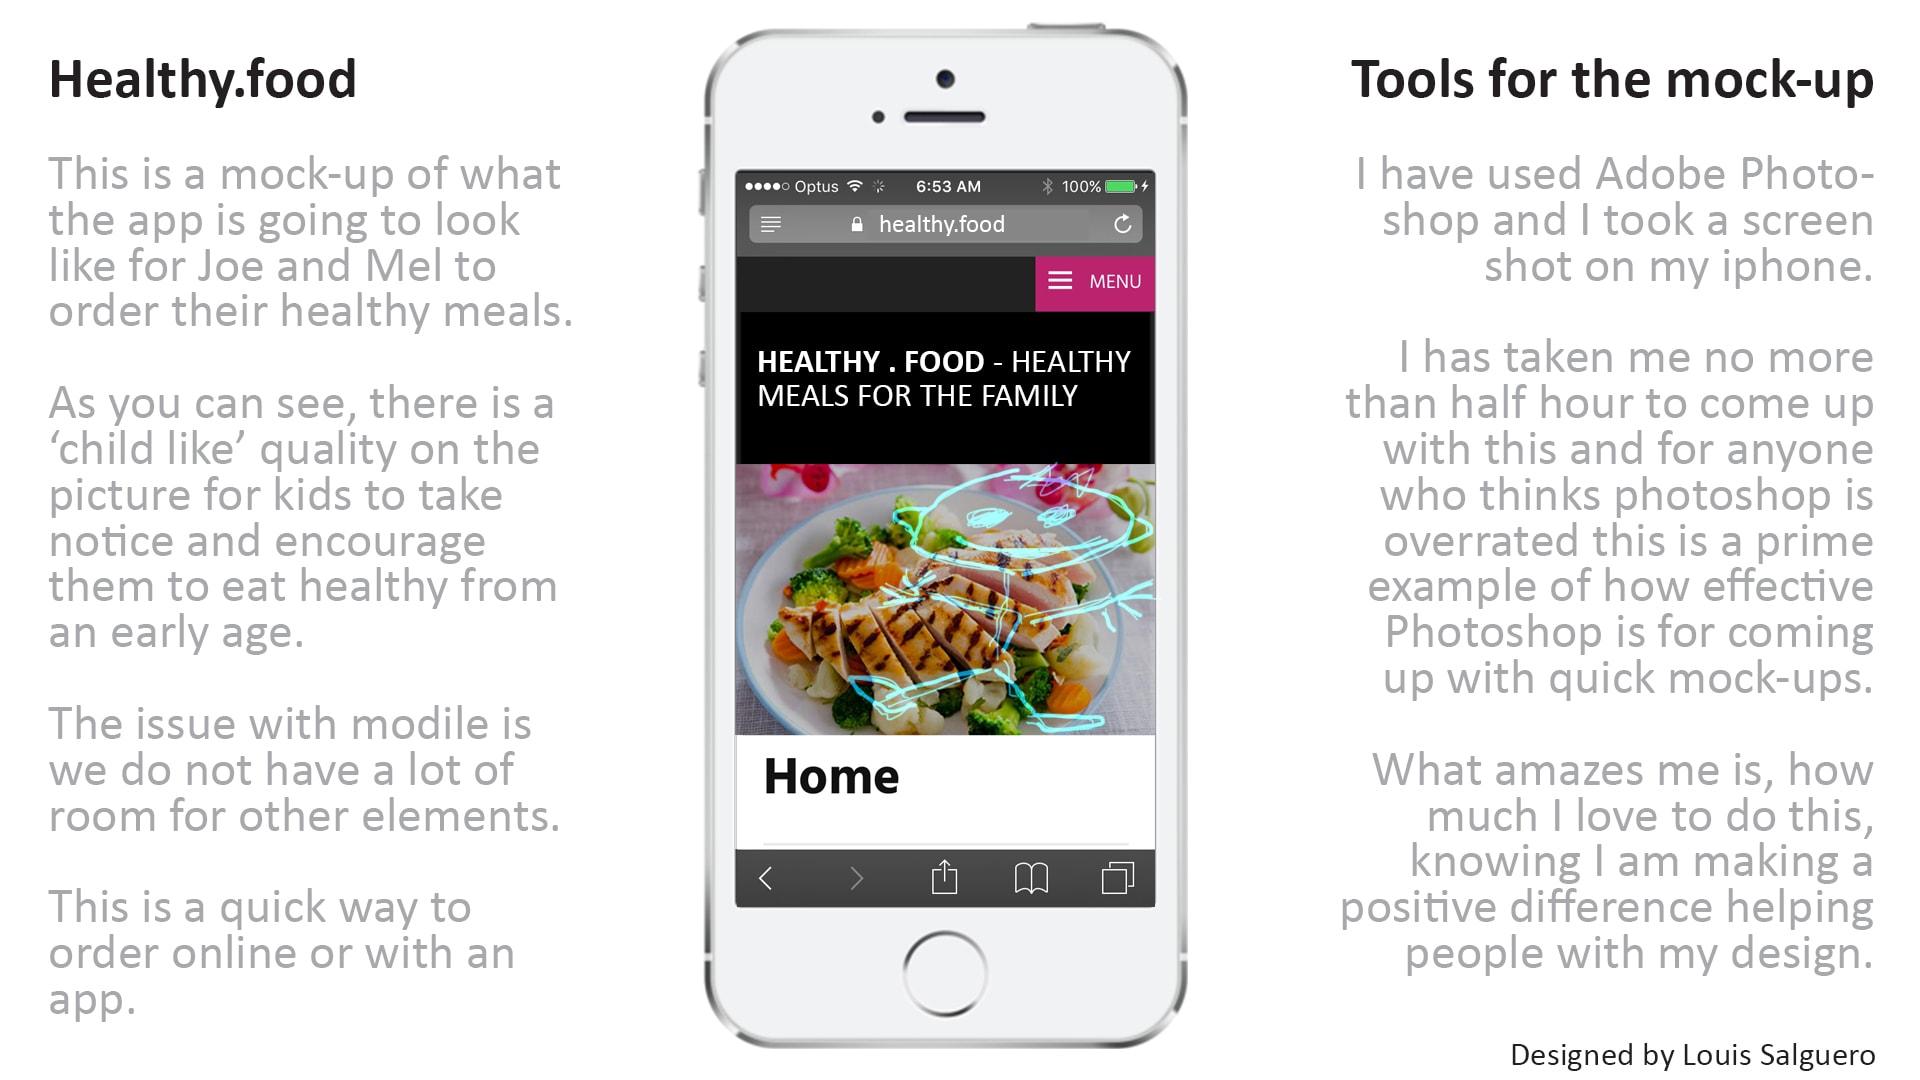 The healthy.food app